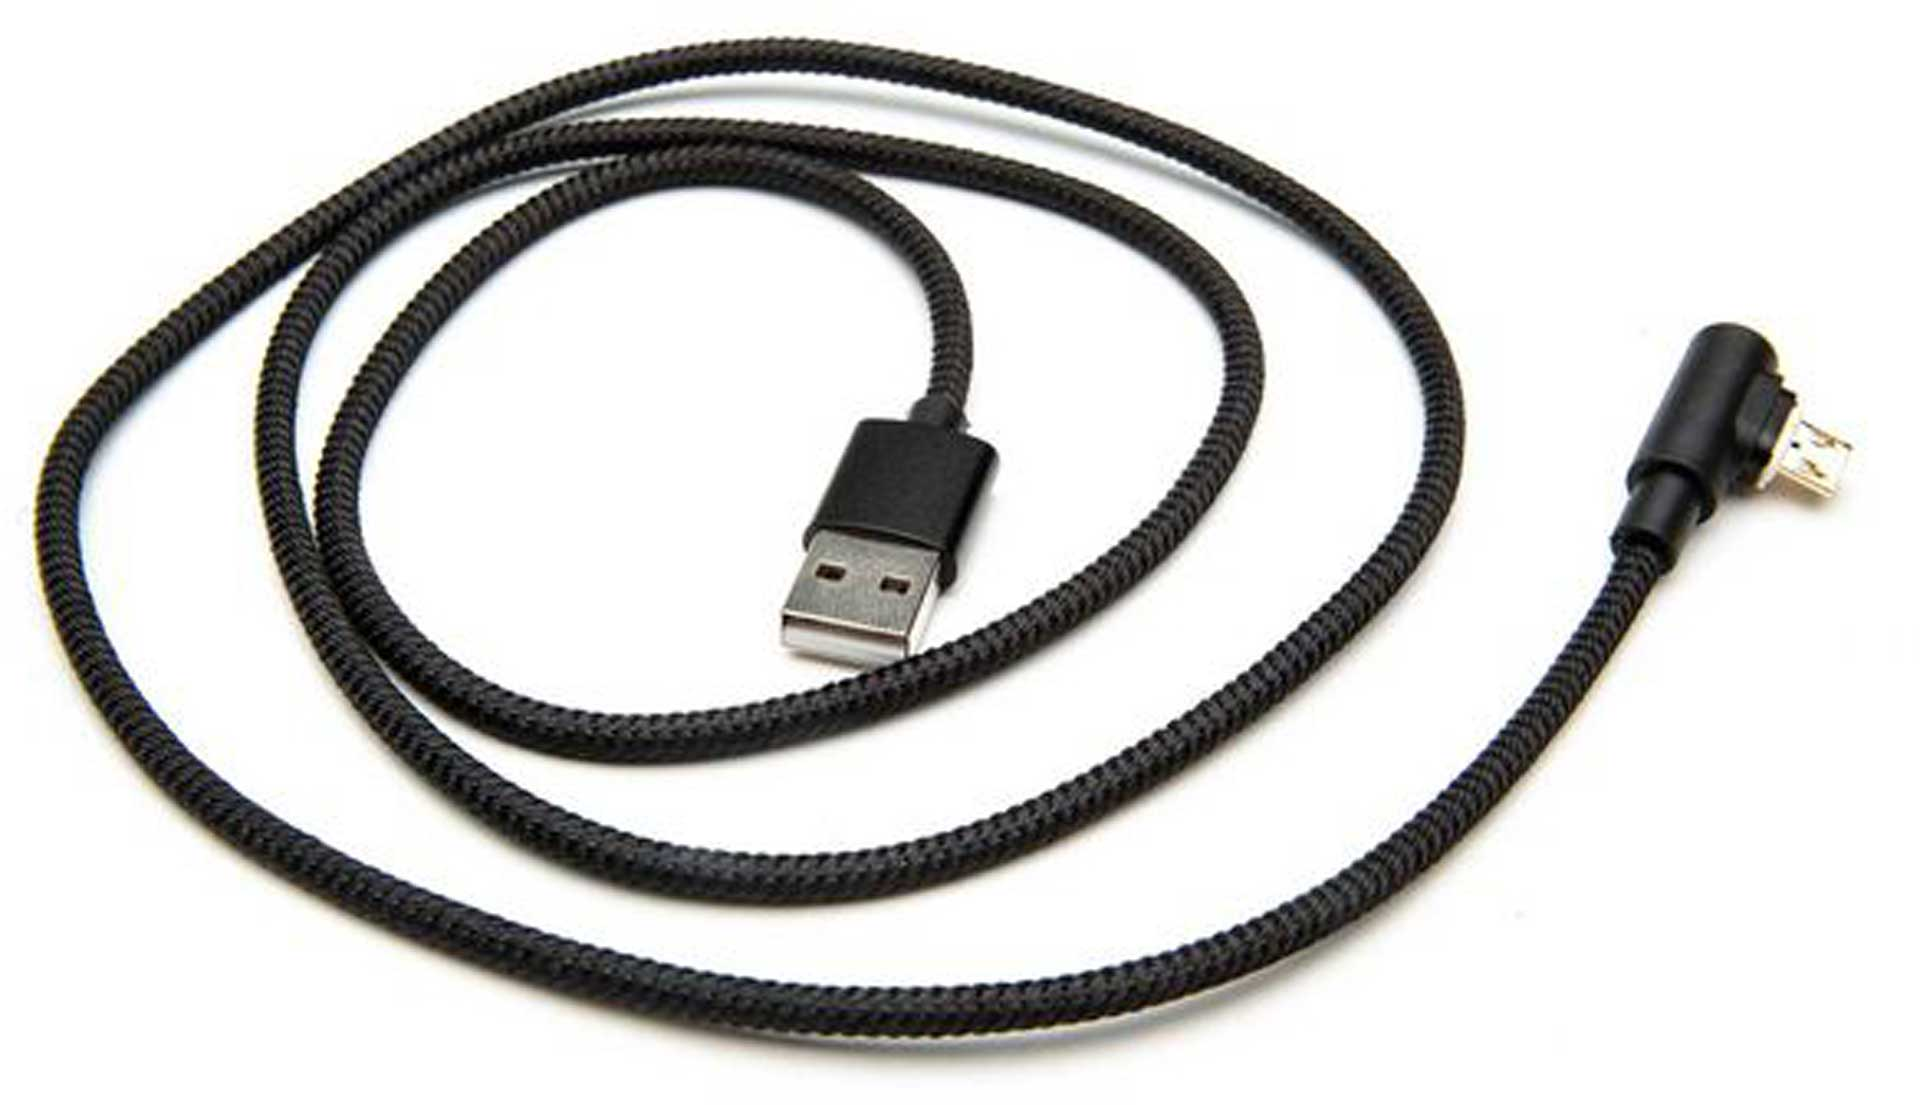 SPEKTRUM Magnet Micro USB Lade-/Datenkabel inkl. Adapter für Spektrum iX12 / iX20